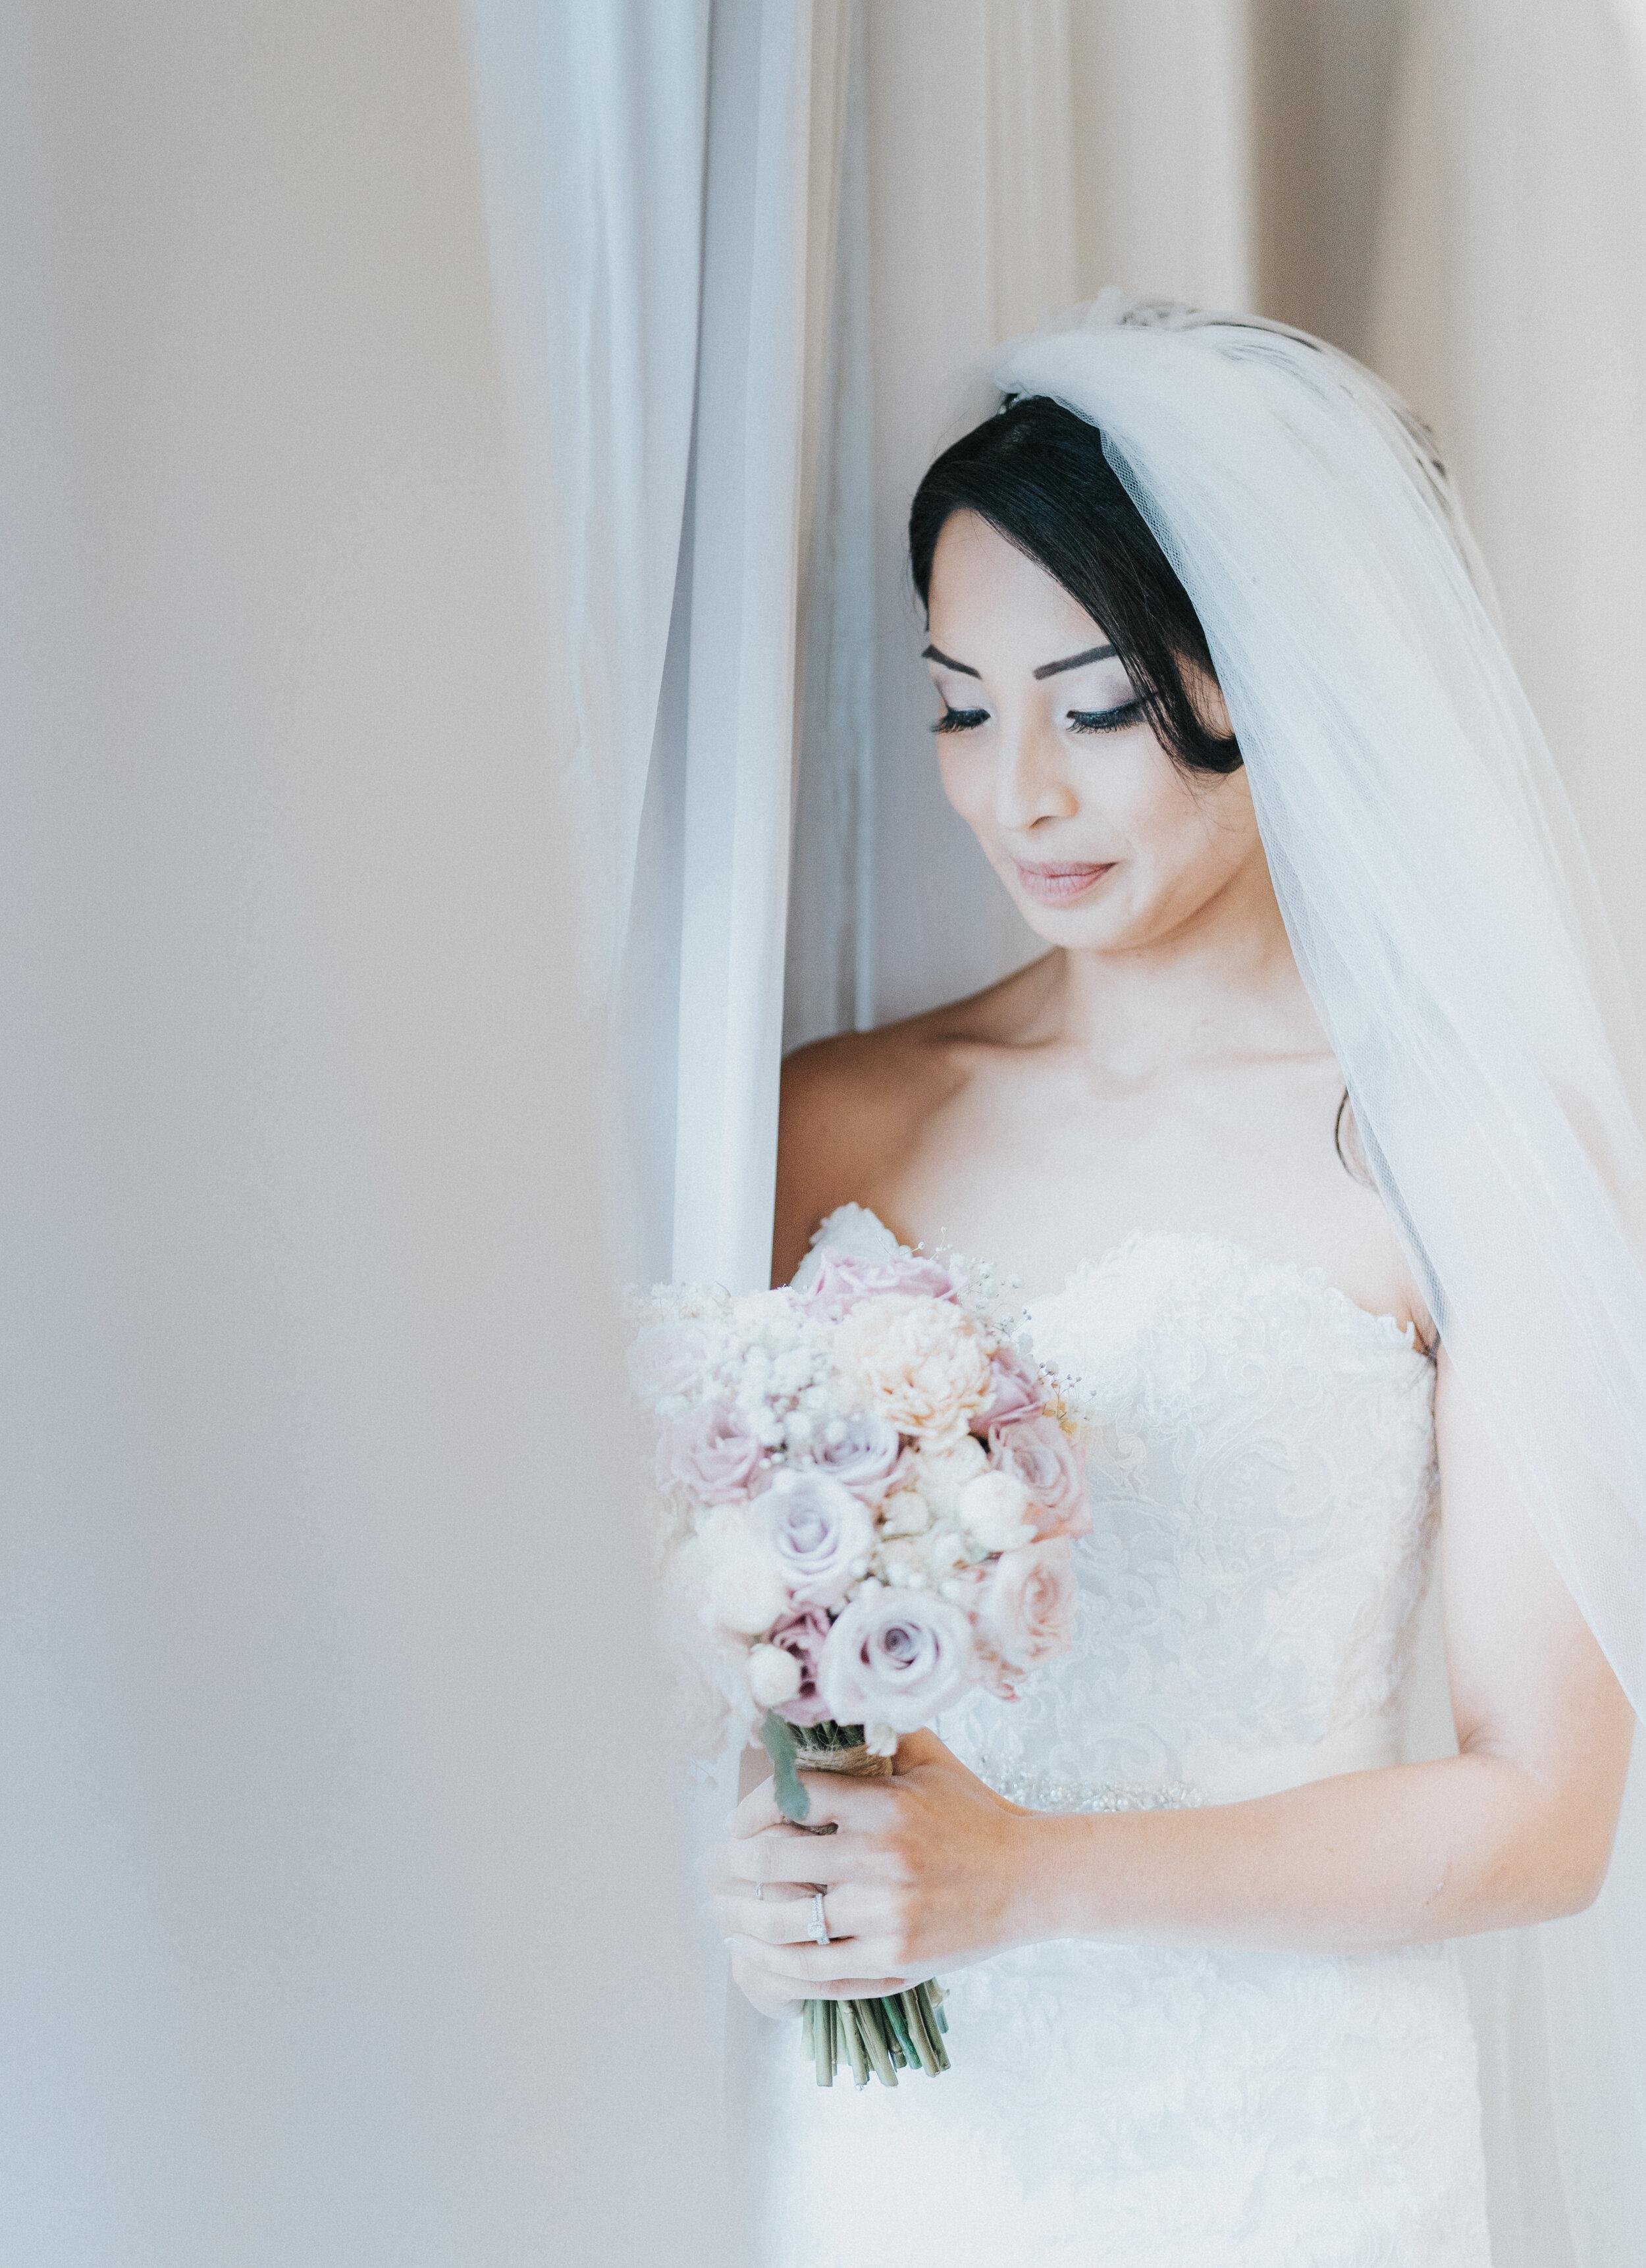 bride-prep-hertfordshire-london-wedding-photographer-09